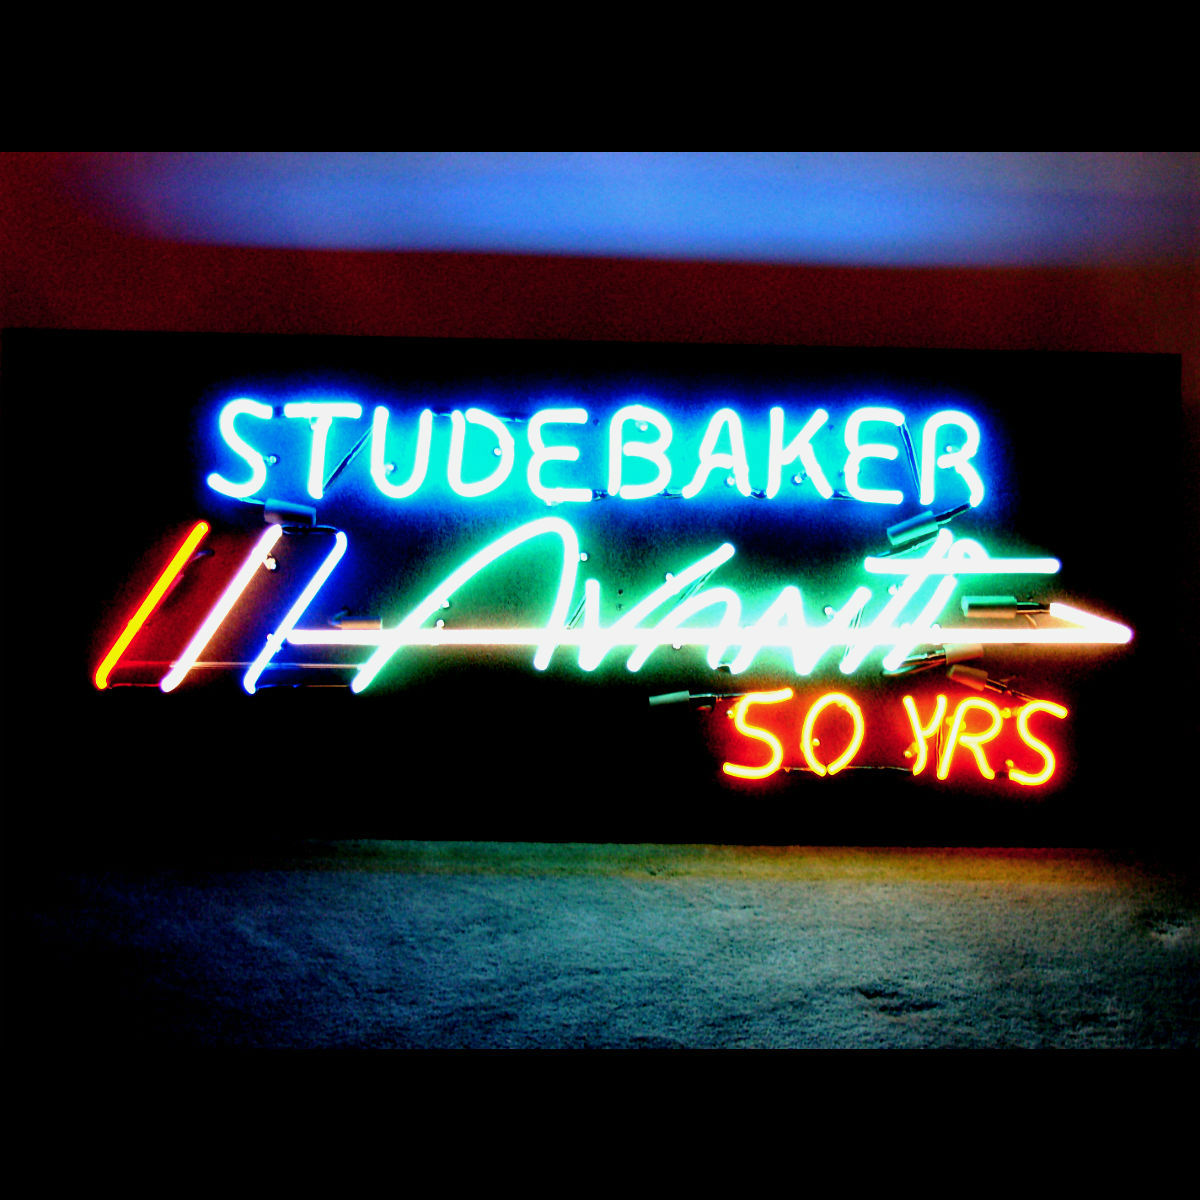 resized Studebaker Avanti 50 years.jpg